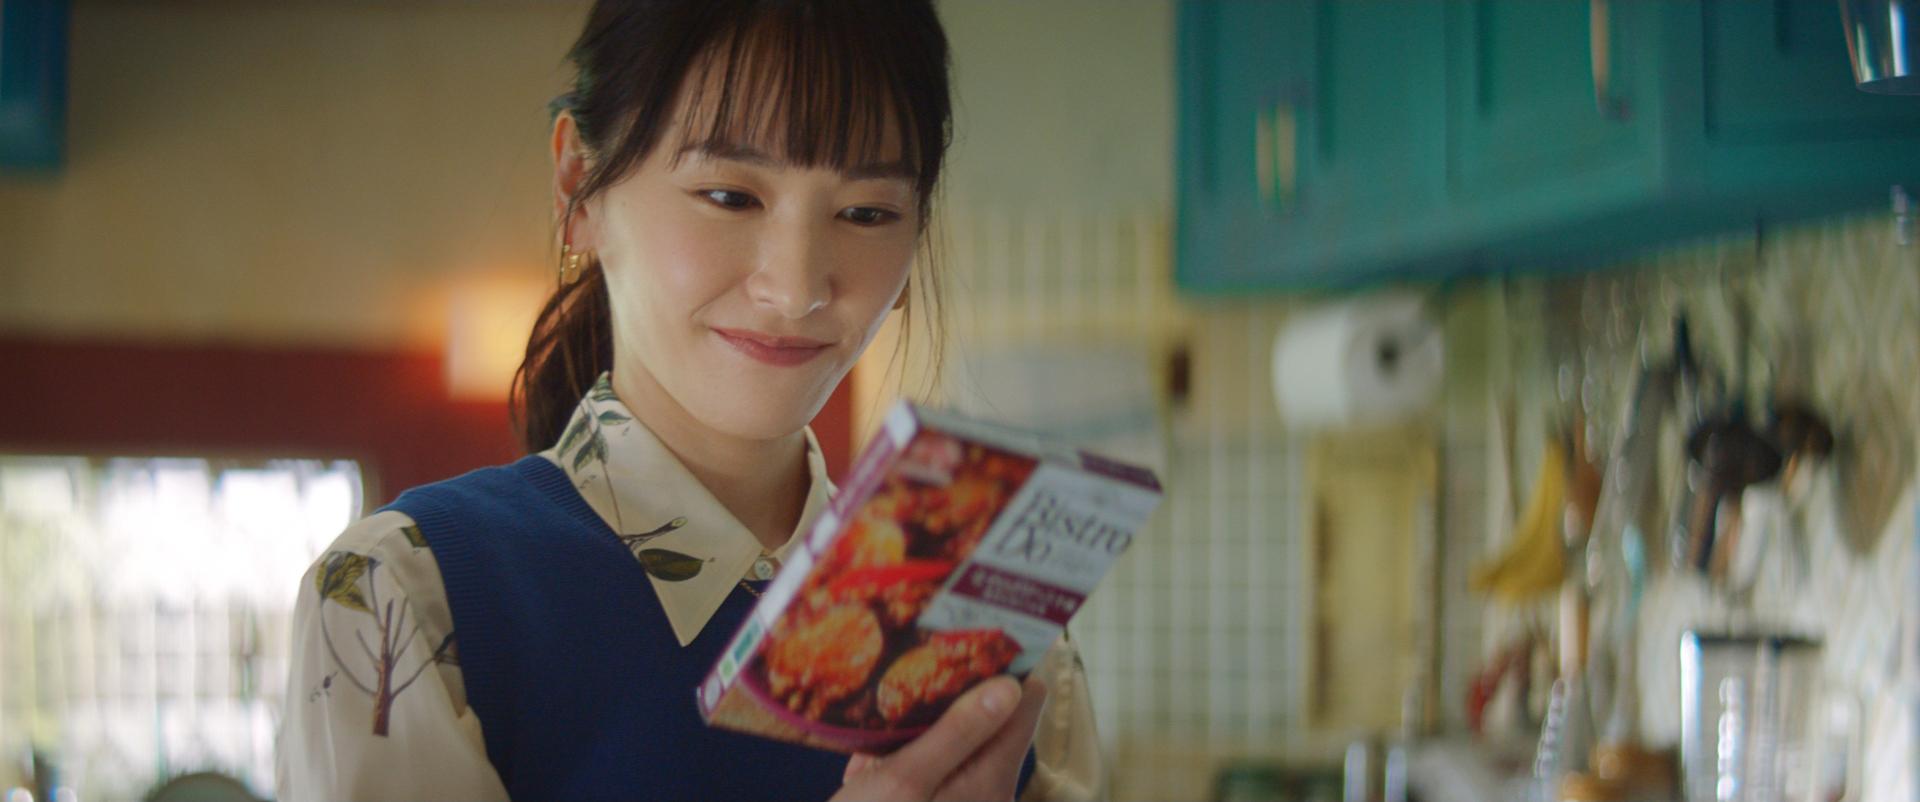 新垣結衣/洋風メニュー用調味料「Bistro Do®」CM ACTRESS 女優